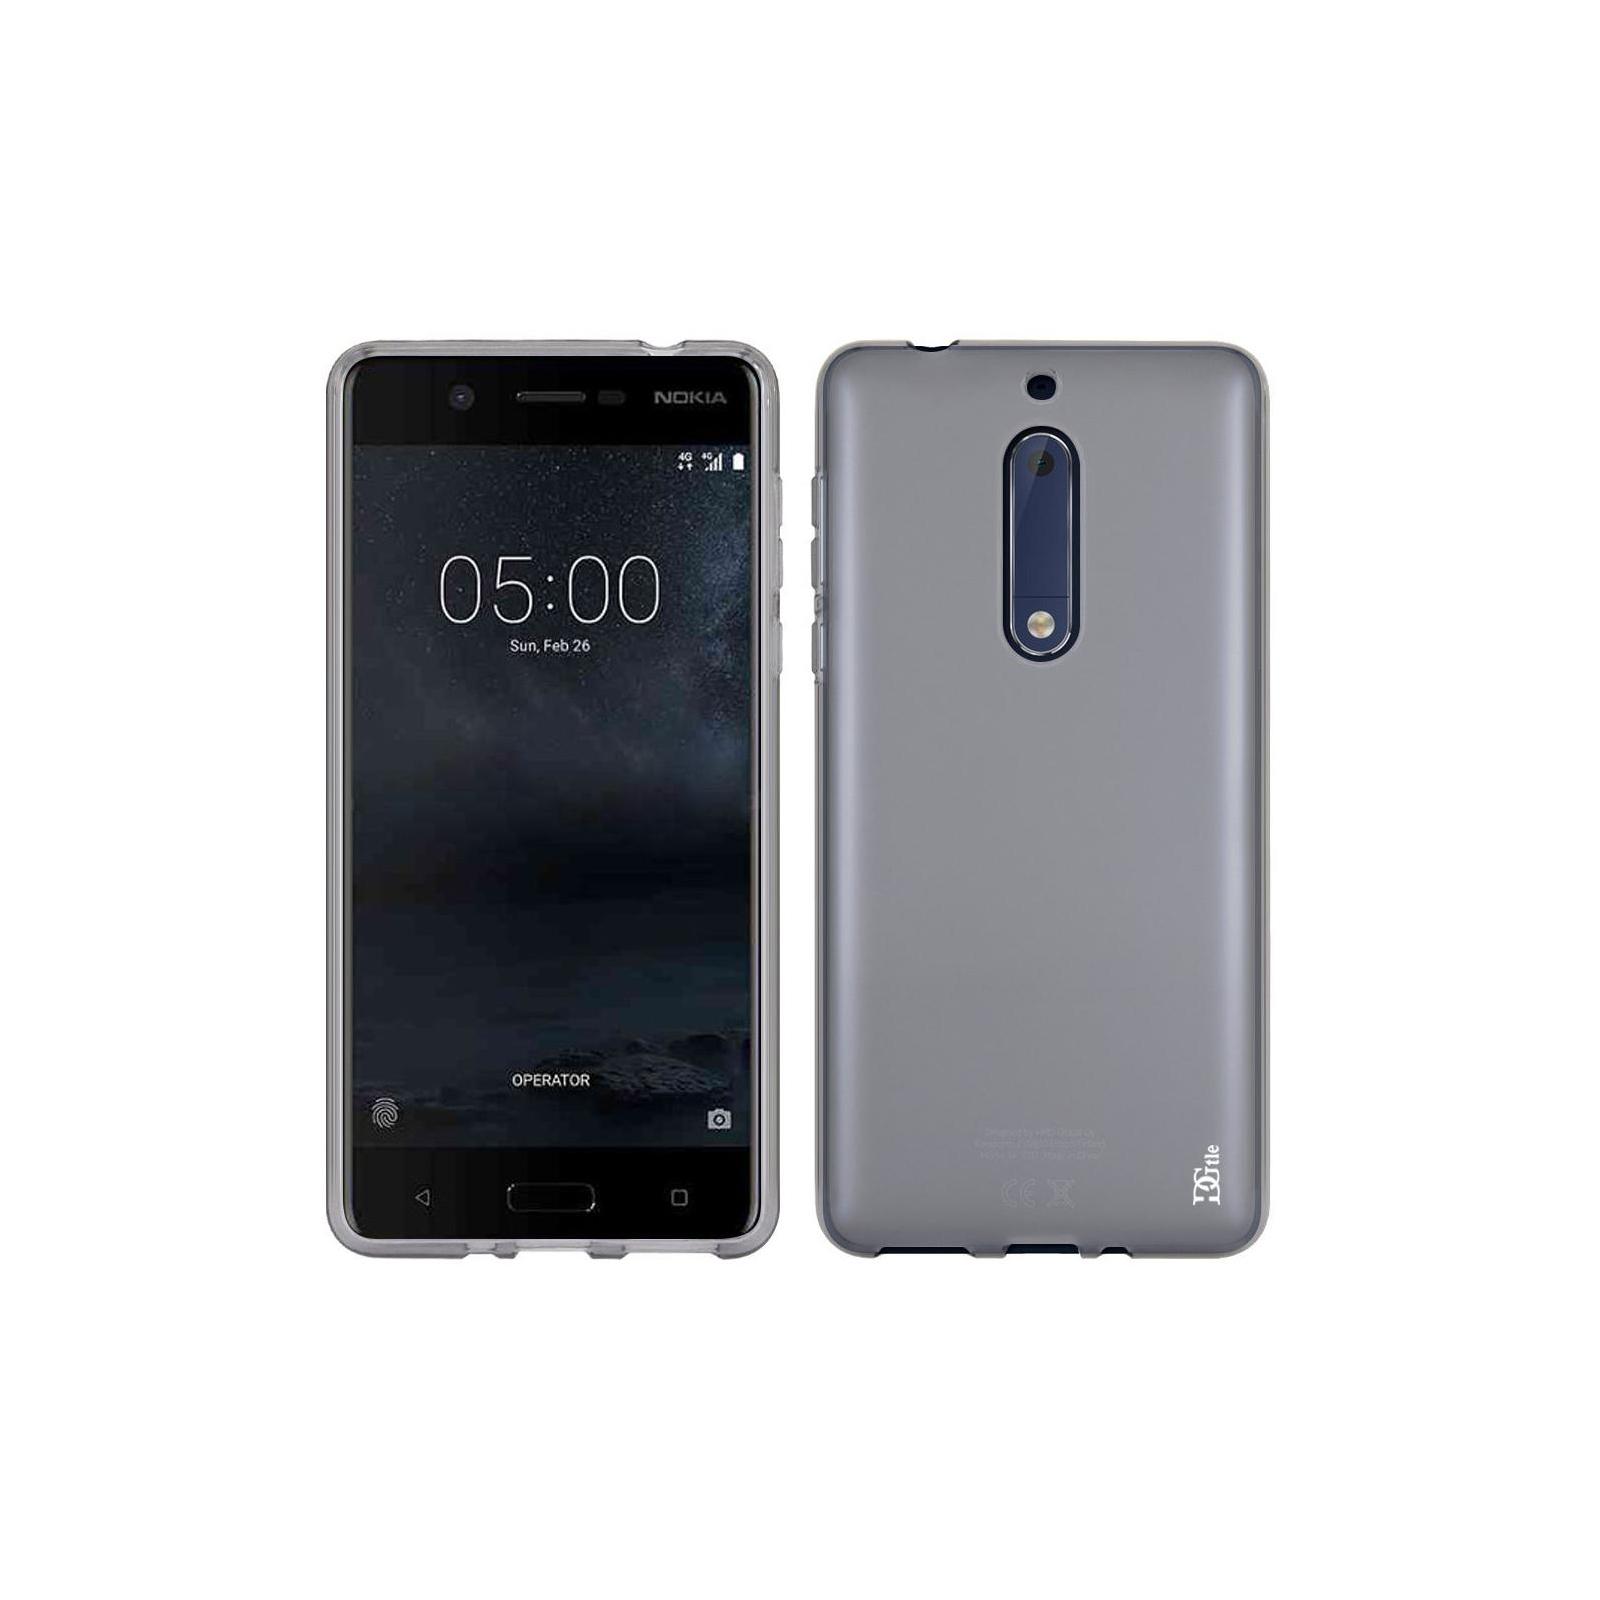 Чехол для моб. телефона SmartCase Nokia 5 TPU Clear (SC-N5) изображение 4